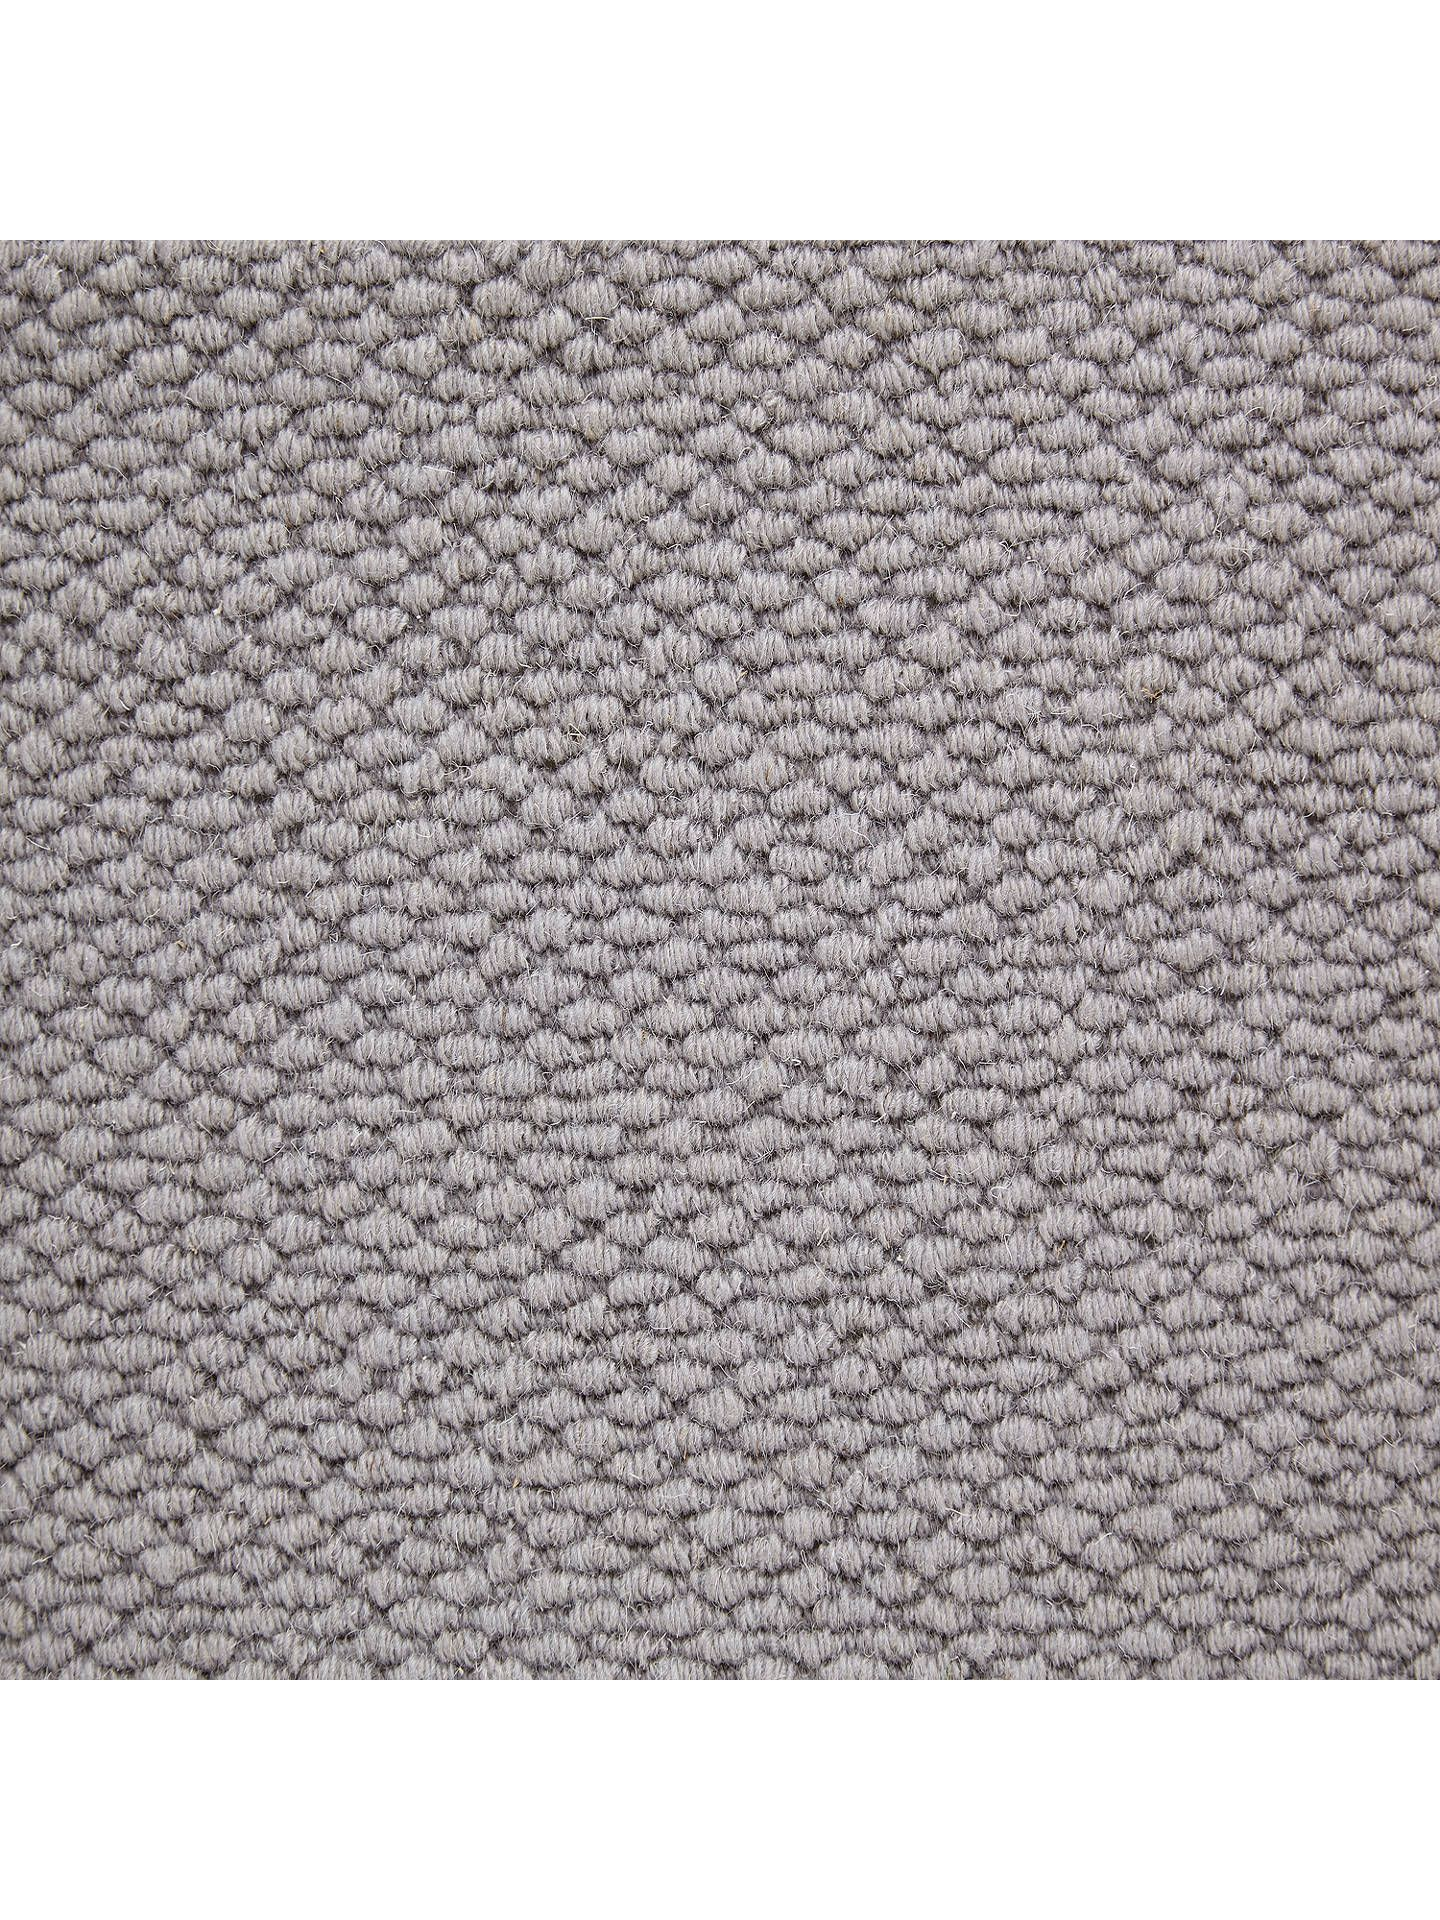 John Lewis Partners Avon Loop Carpet Weave Ash Cost Of Carpet Carpet Fitting John Lewis